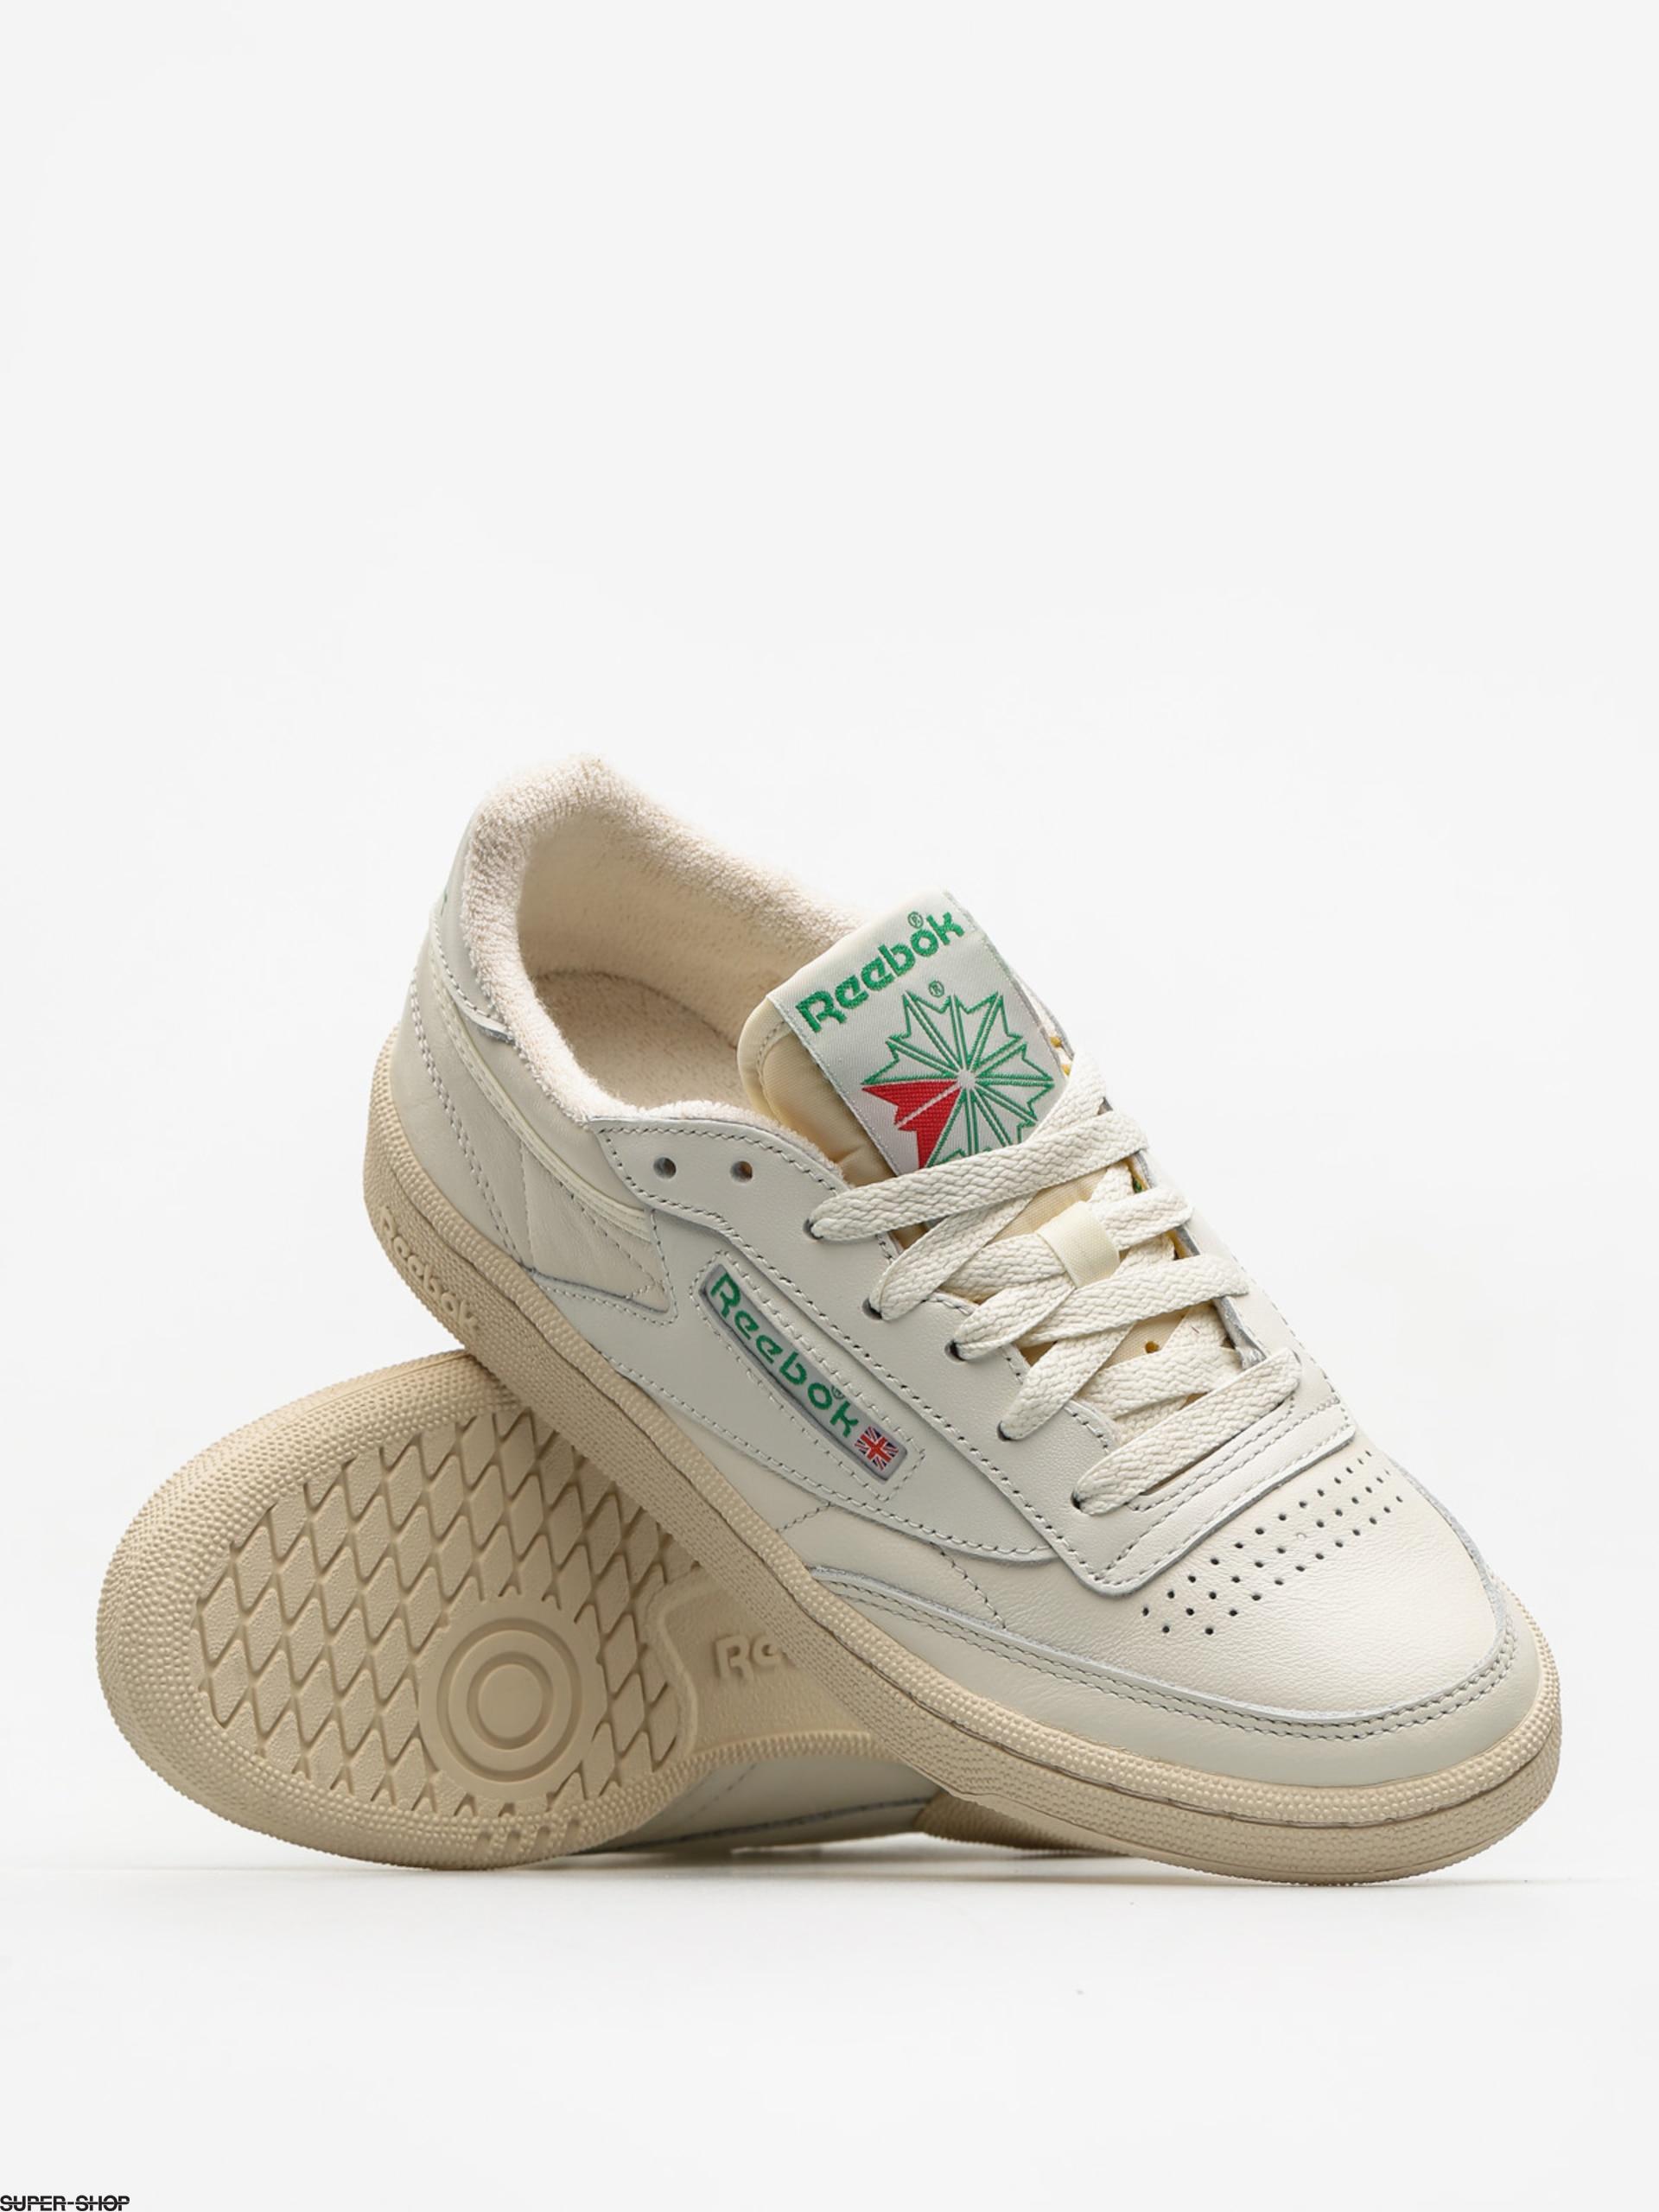 Red Sneaker Schuhe White Reebok Green WMN Club C 85 Chalk